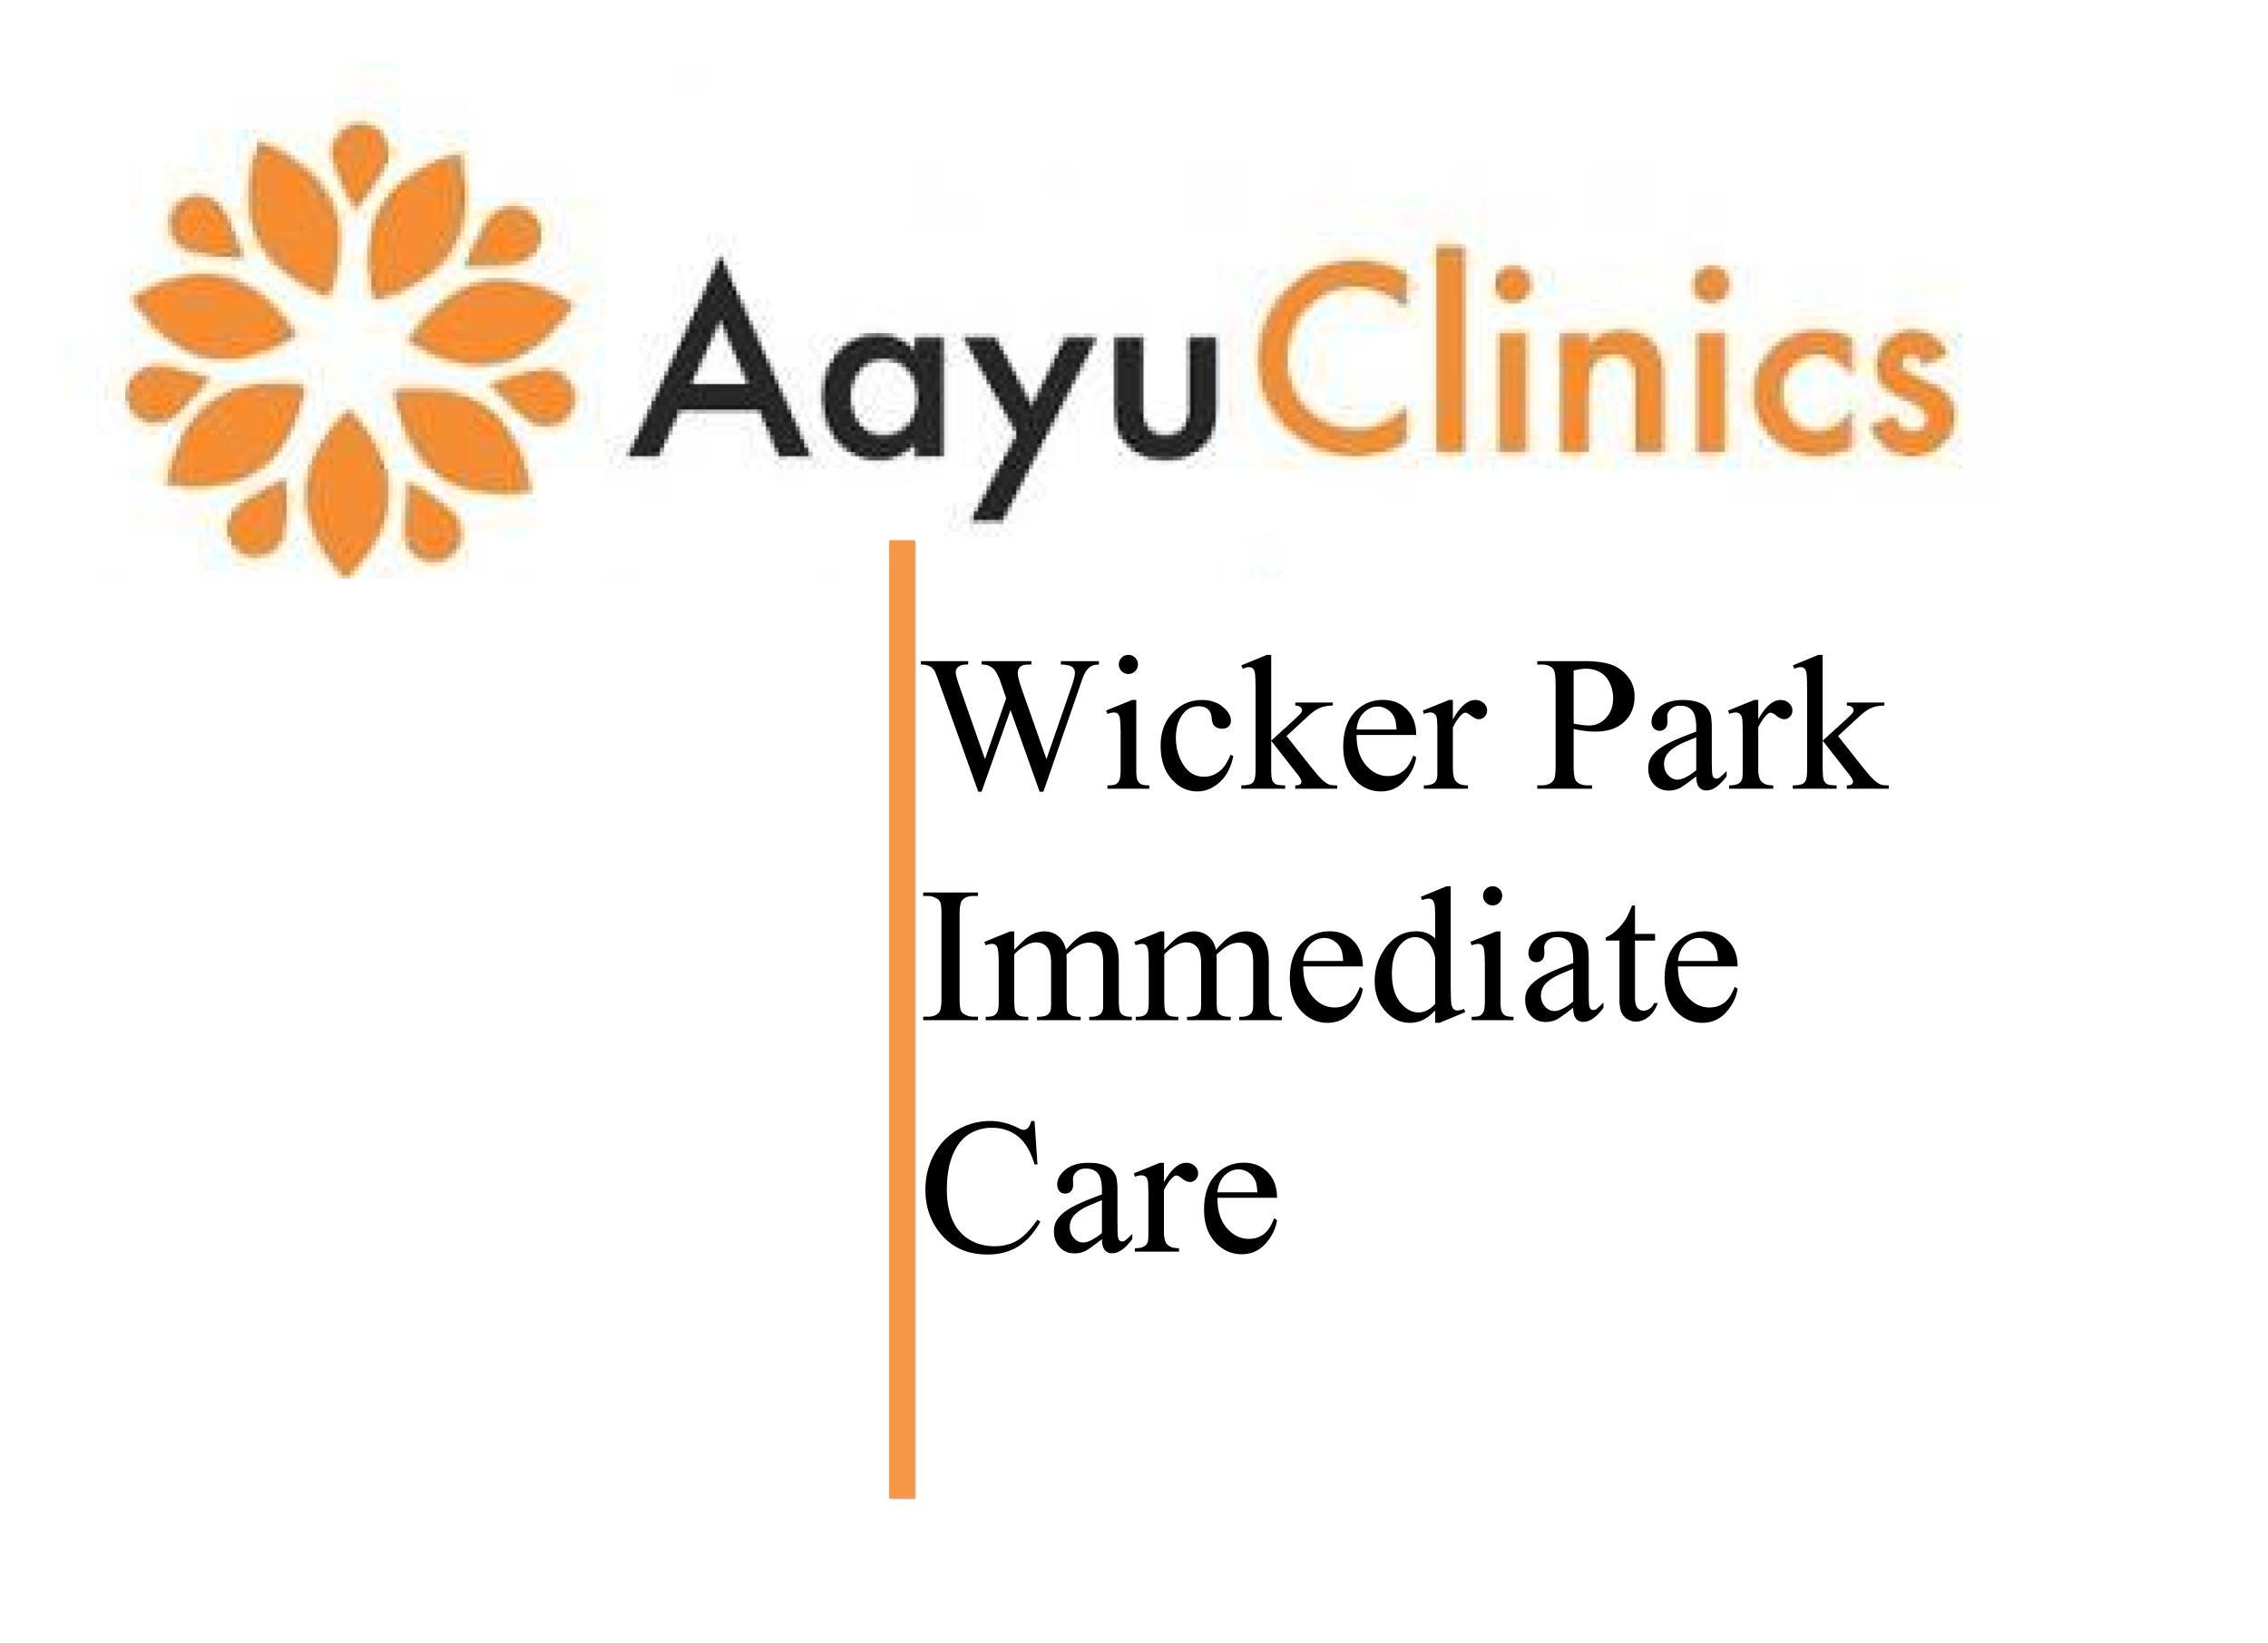 Aayu Clinics - Wicker Park Immediate Care Logo